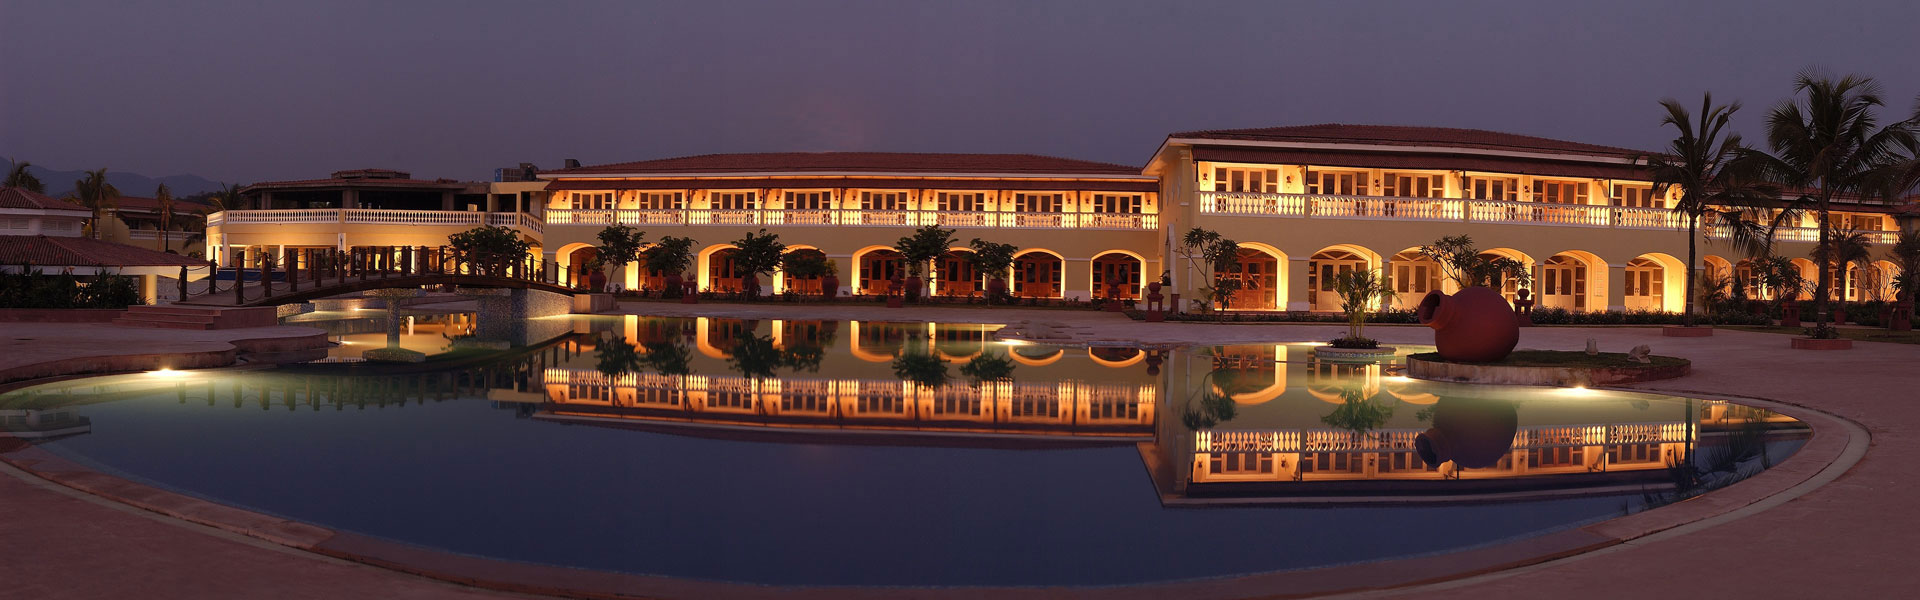 Star Hotel In Goa